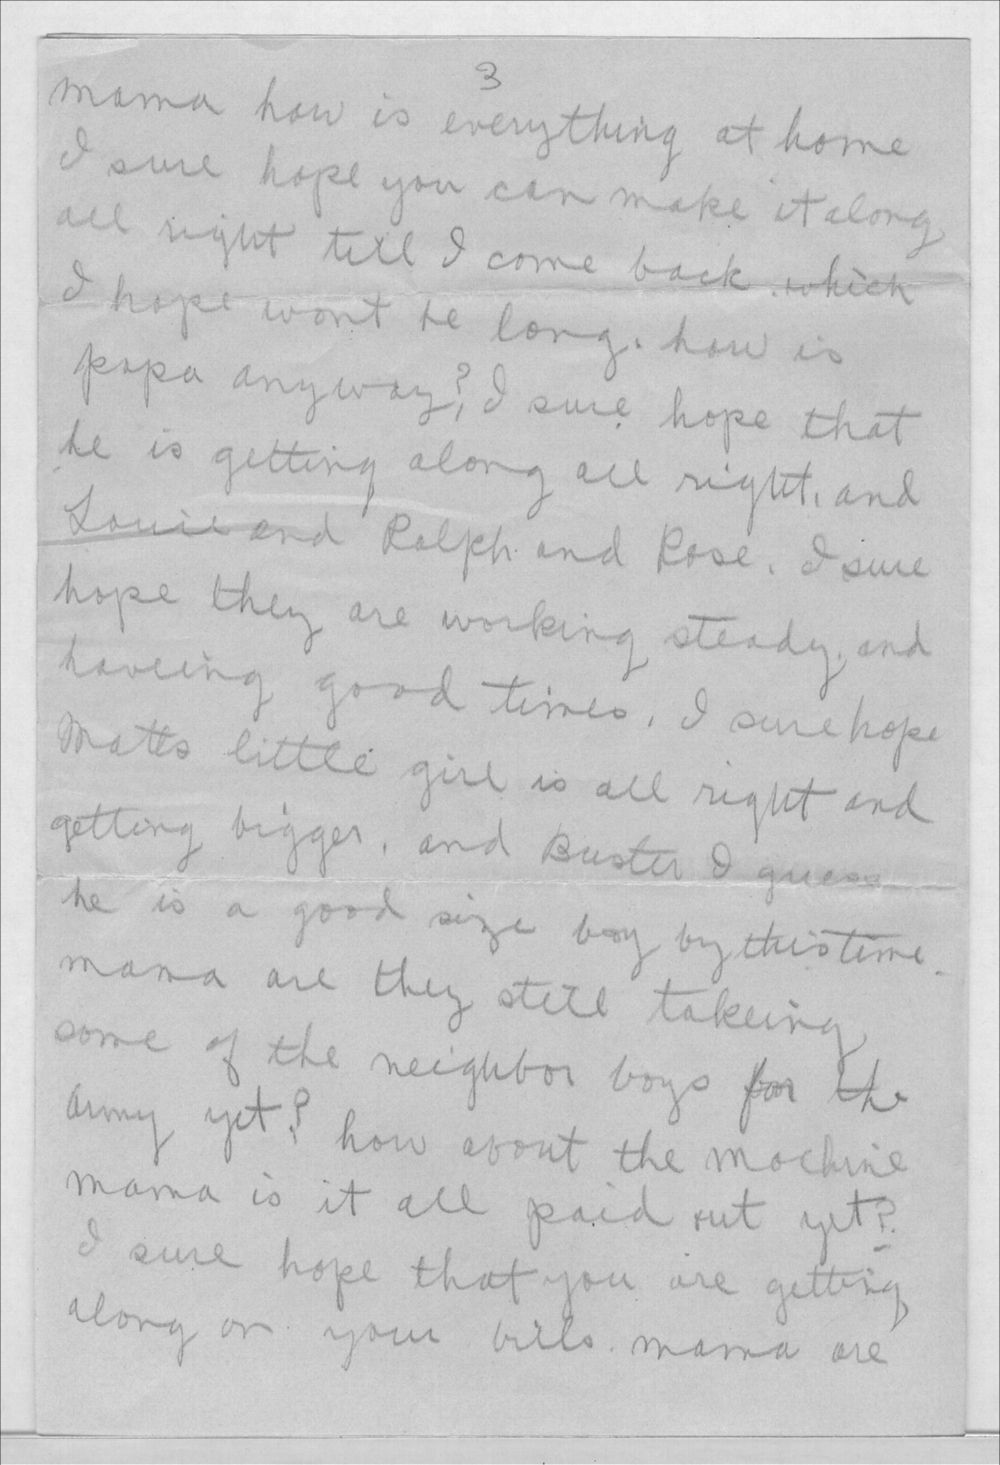 John A. Gersic to Mrs. Joseph Gersic - 3